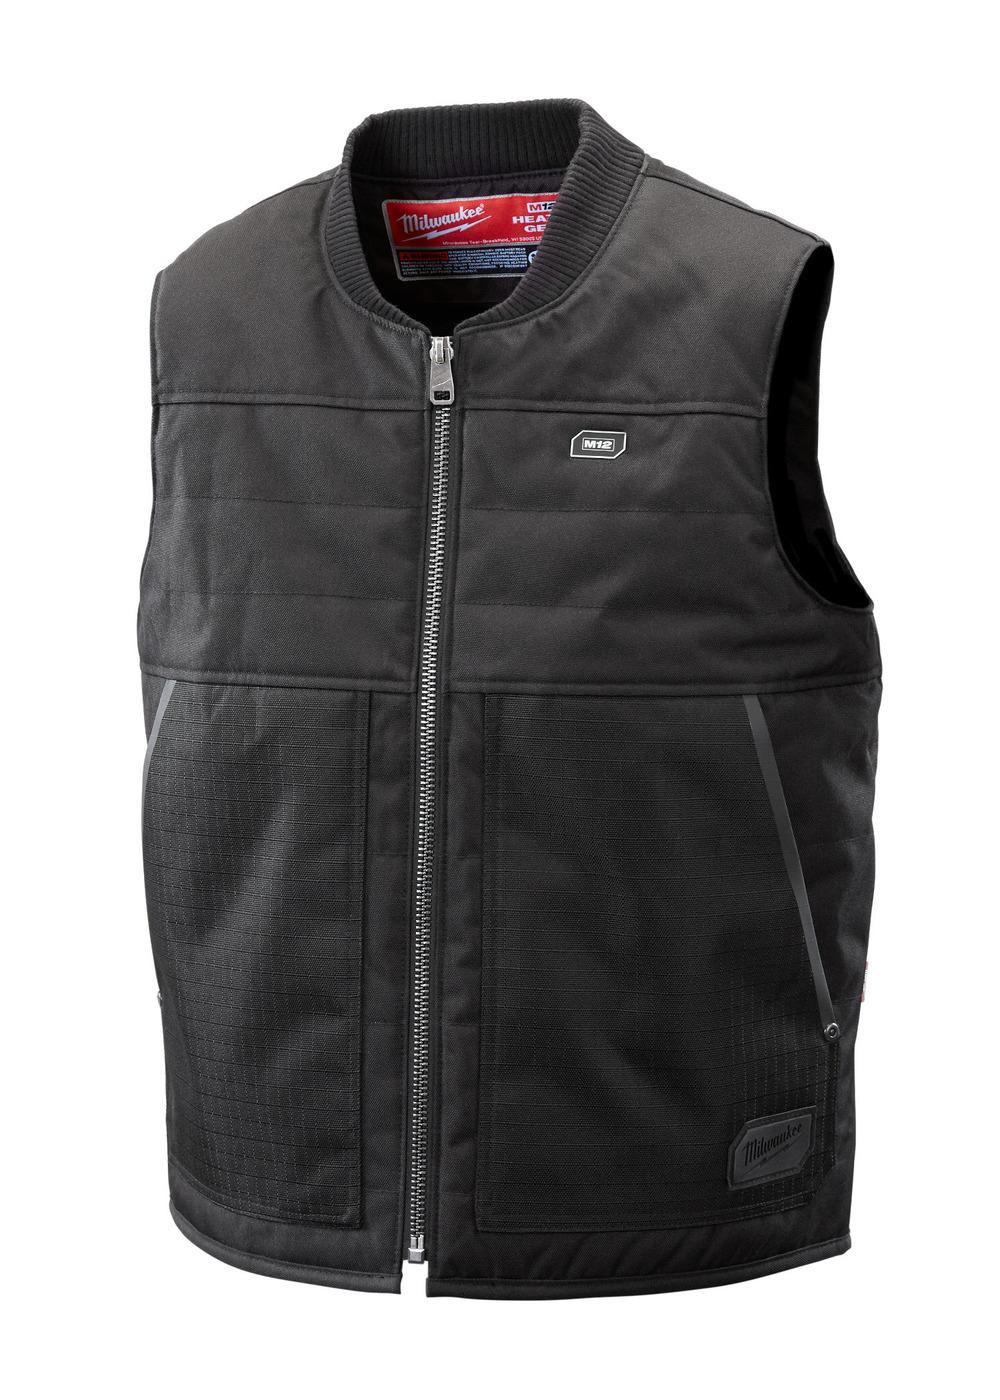 M12 Heated Ripstop Vest